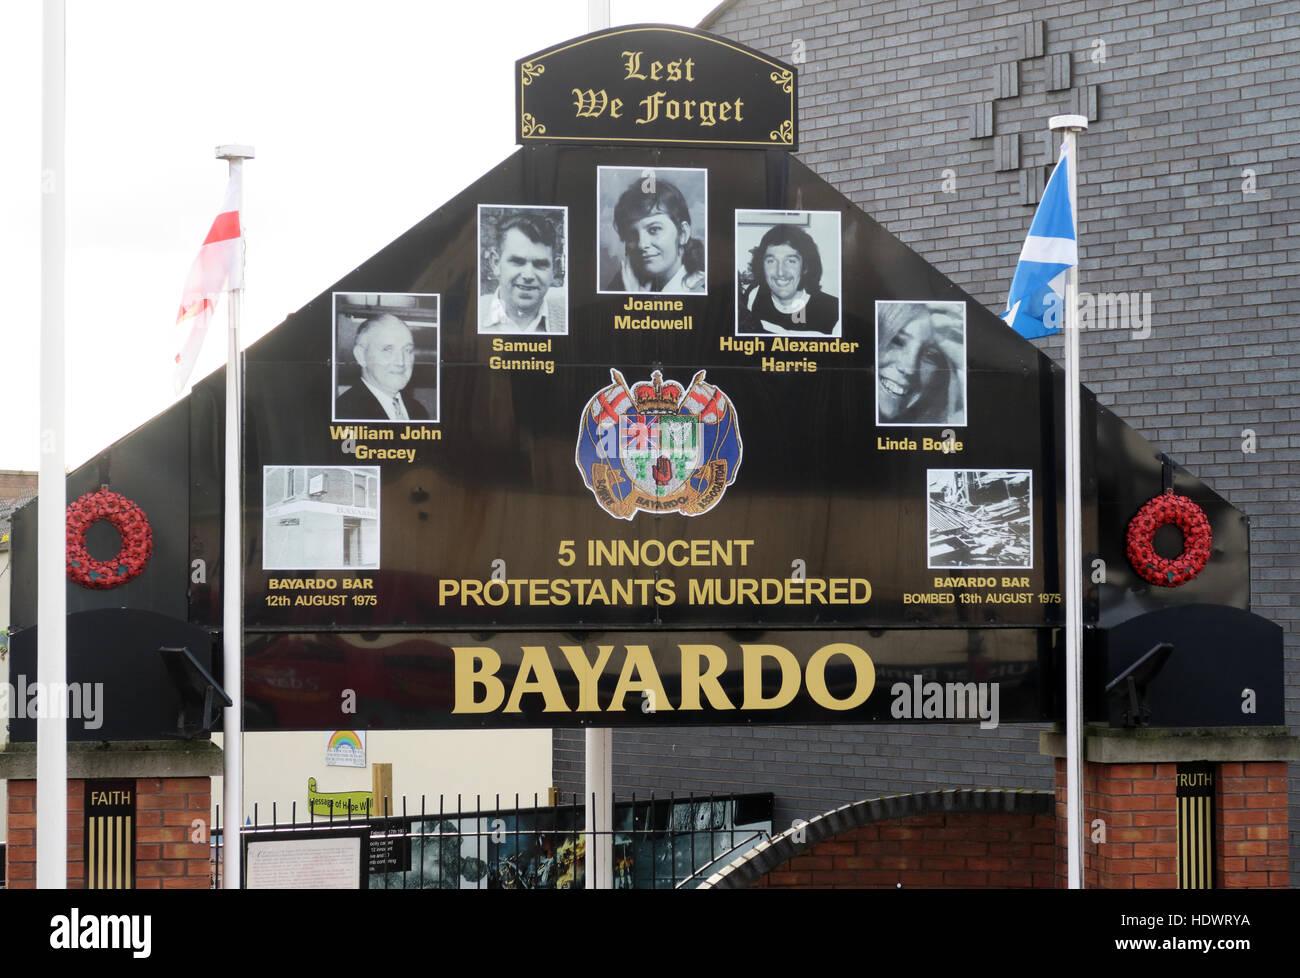 Bayardo Bar mural, off Shankill Road West Belfast,Northern Ireland,UK - Stock Image